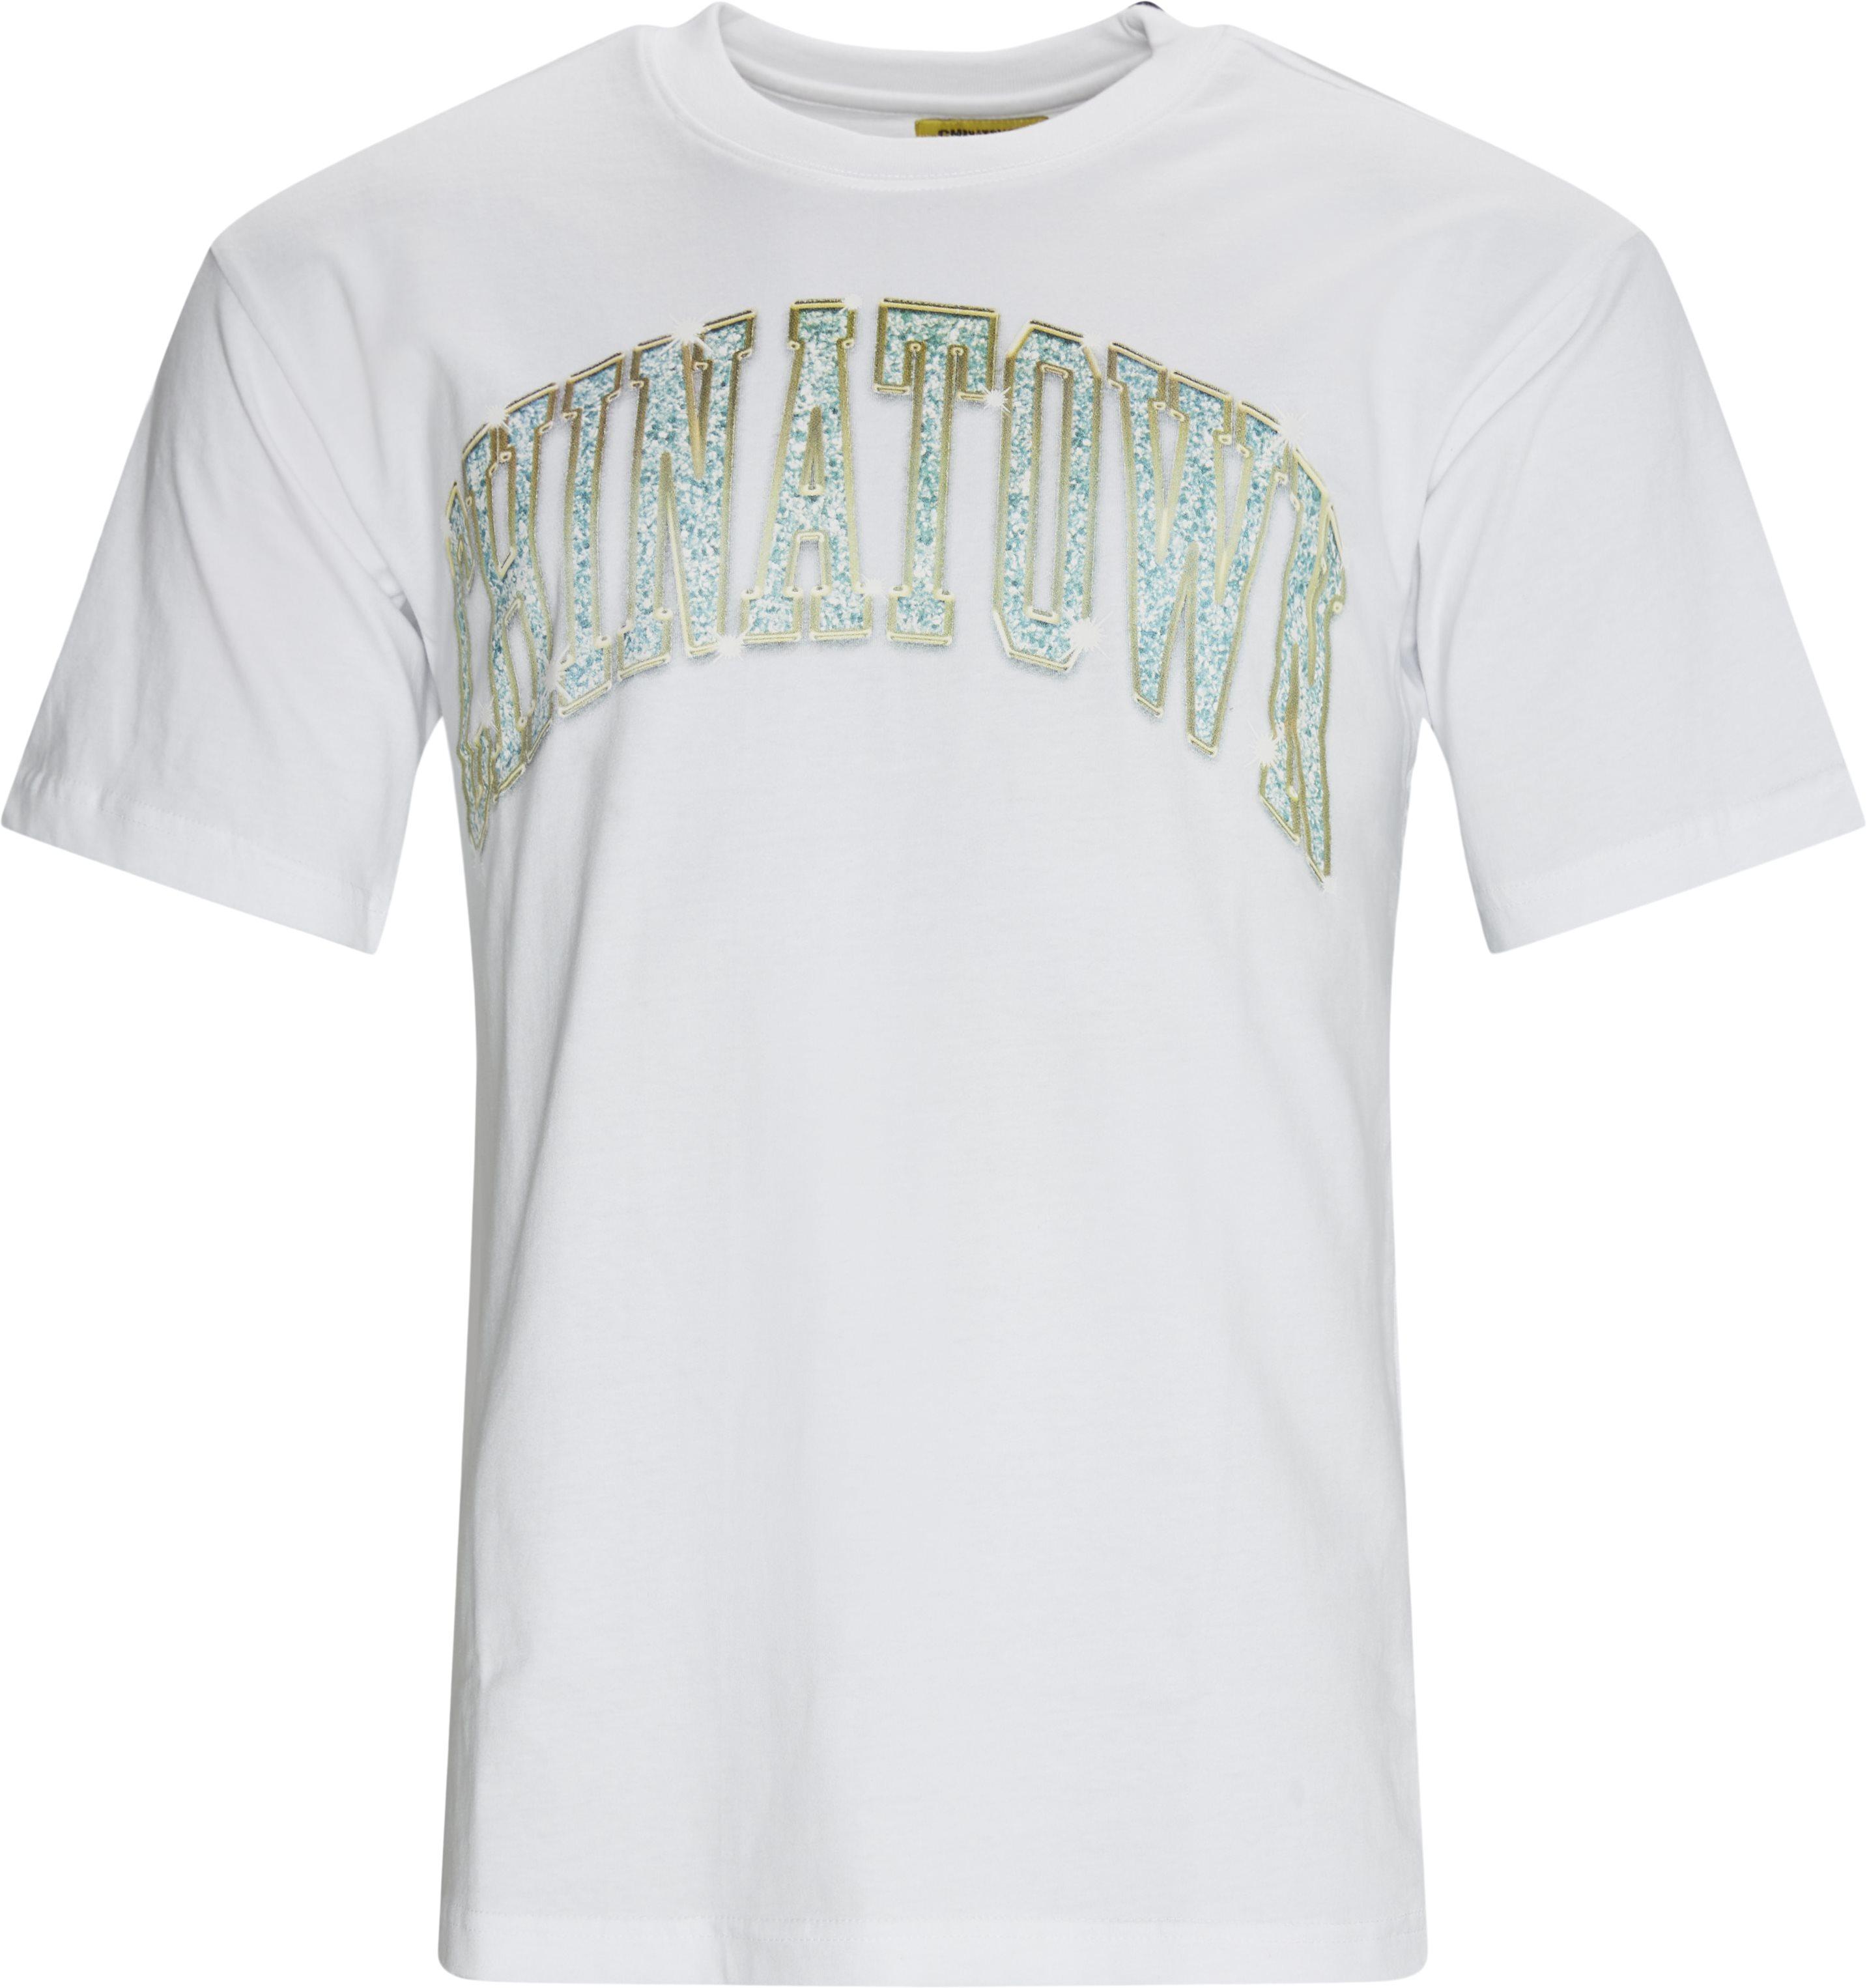 Bling Arc Tee - T-shirts - Regular fit - Hvid